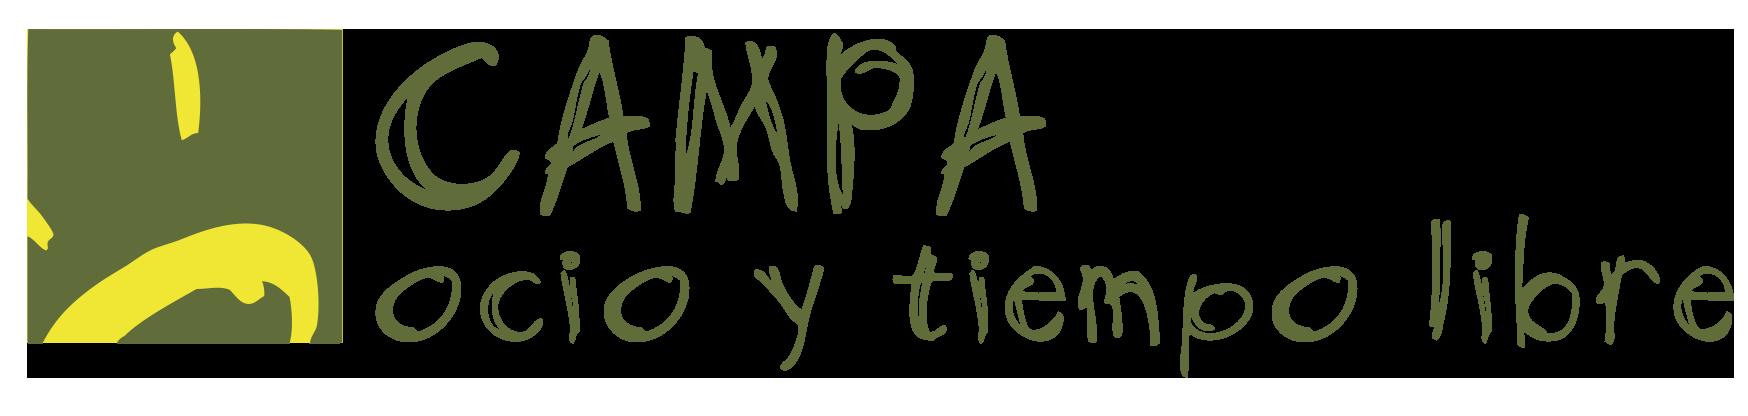 logo_campaoc